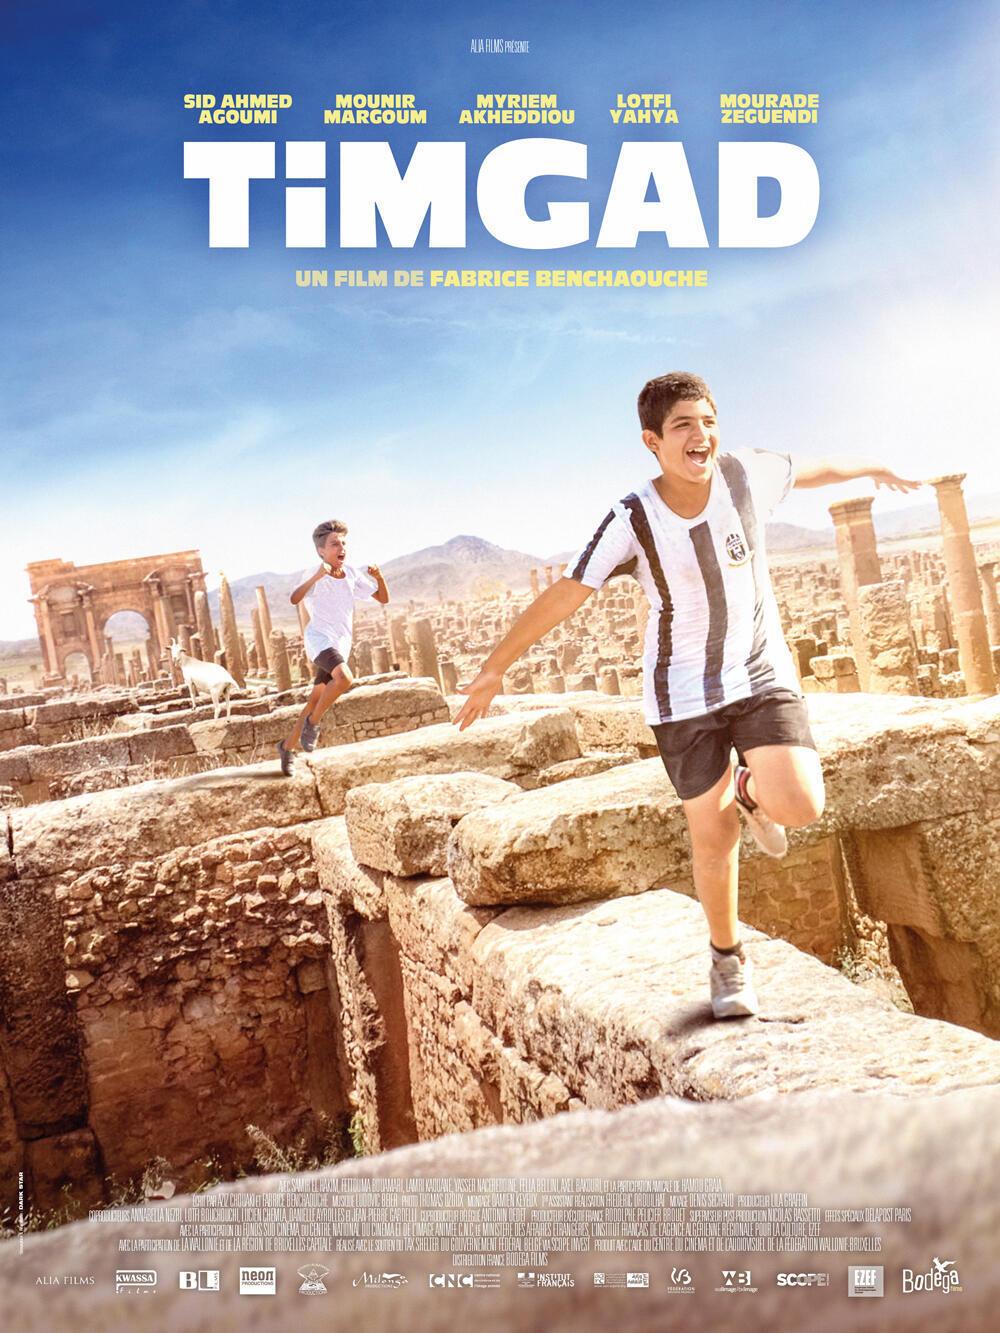 «Timgad», un film de Fabrice Benchaouche.